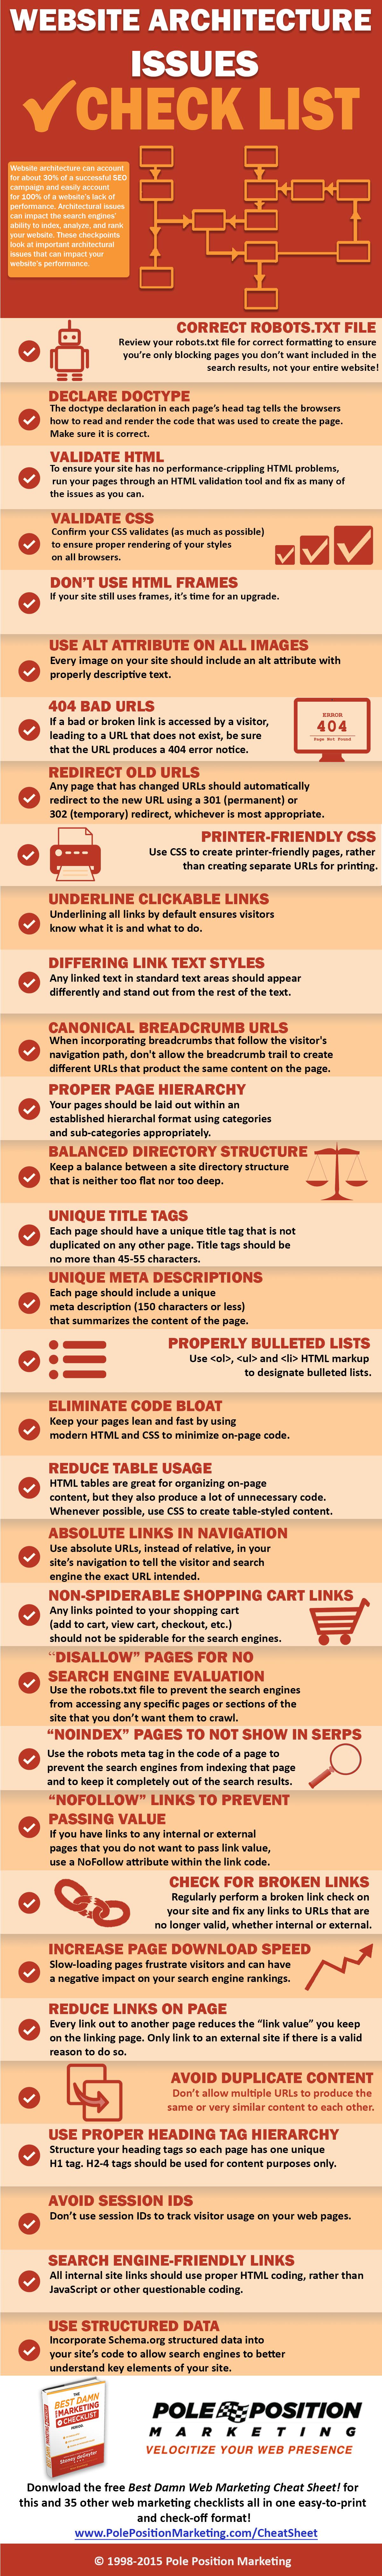 Website Architecture Issues Checklist